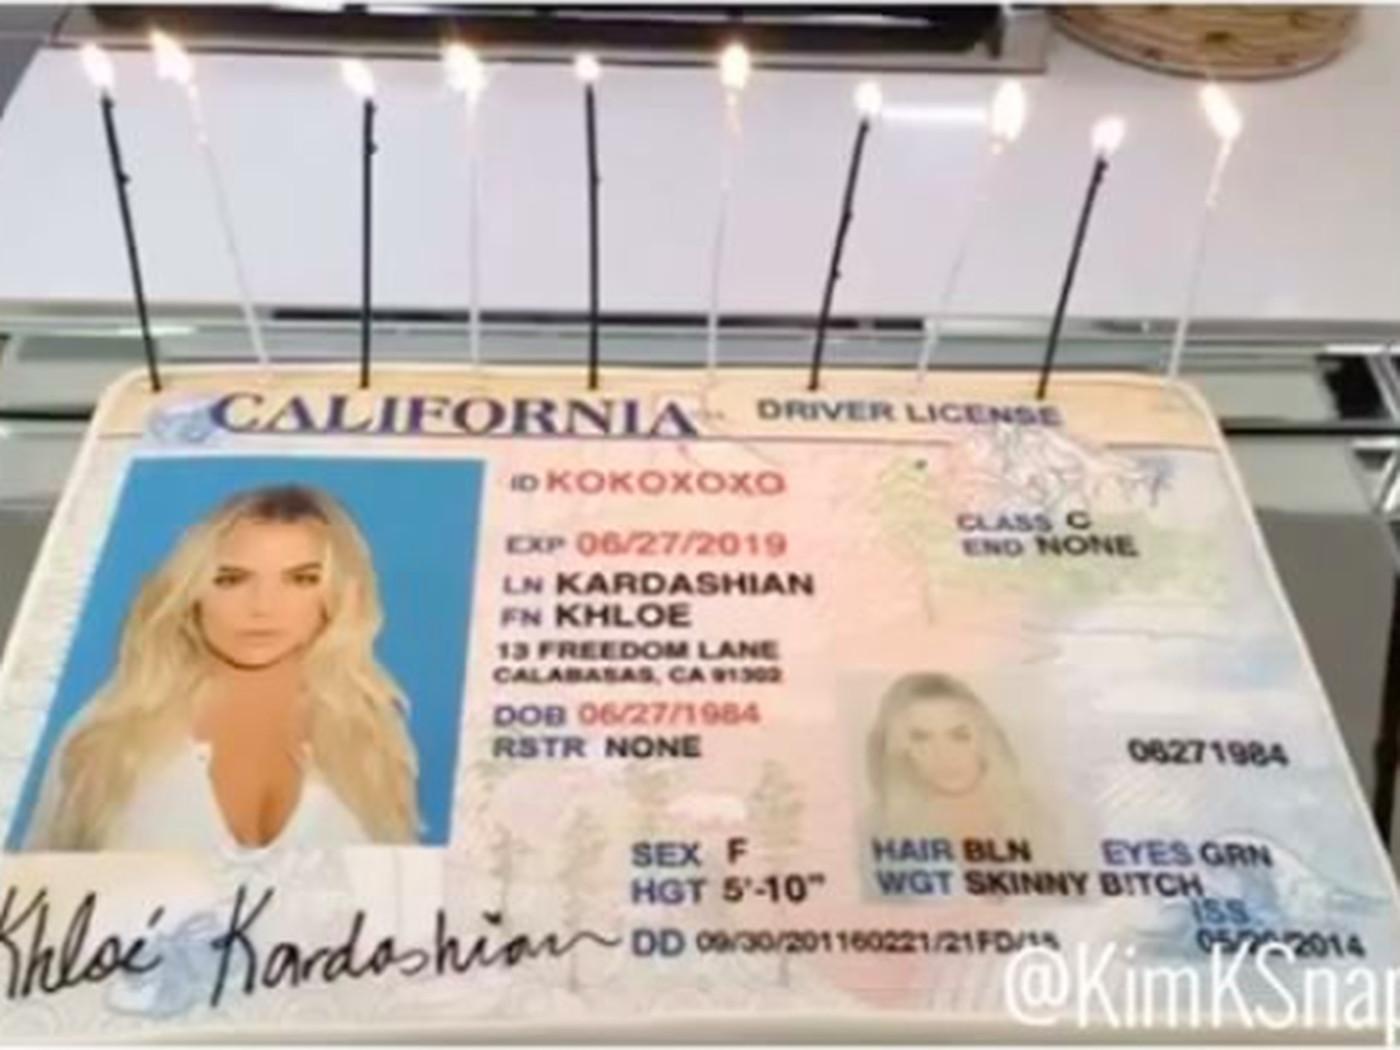 Eater A With Cake Driver's Kardashian Celebrates Khloé - License Her Divorce